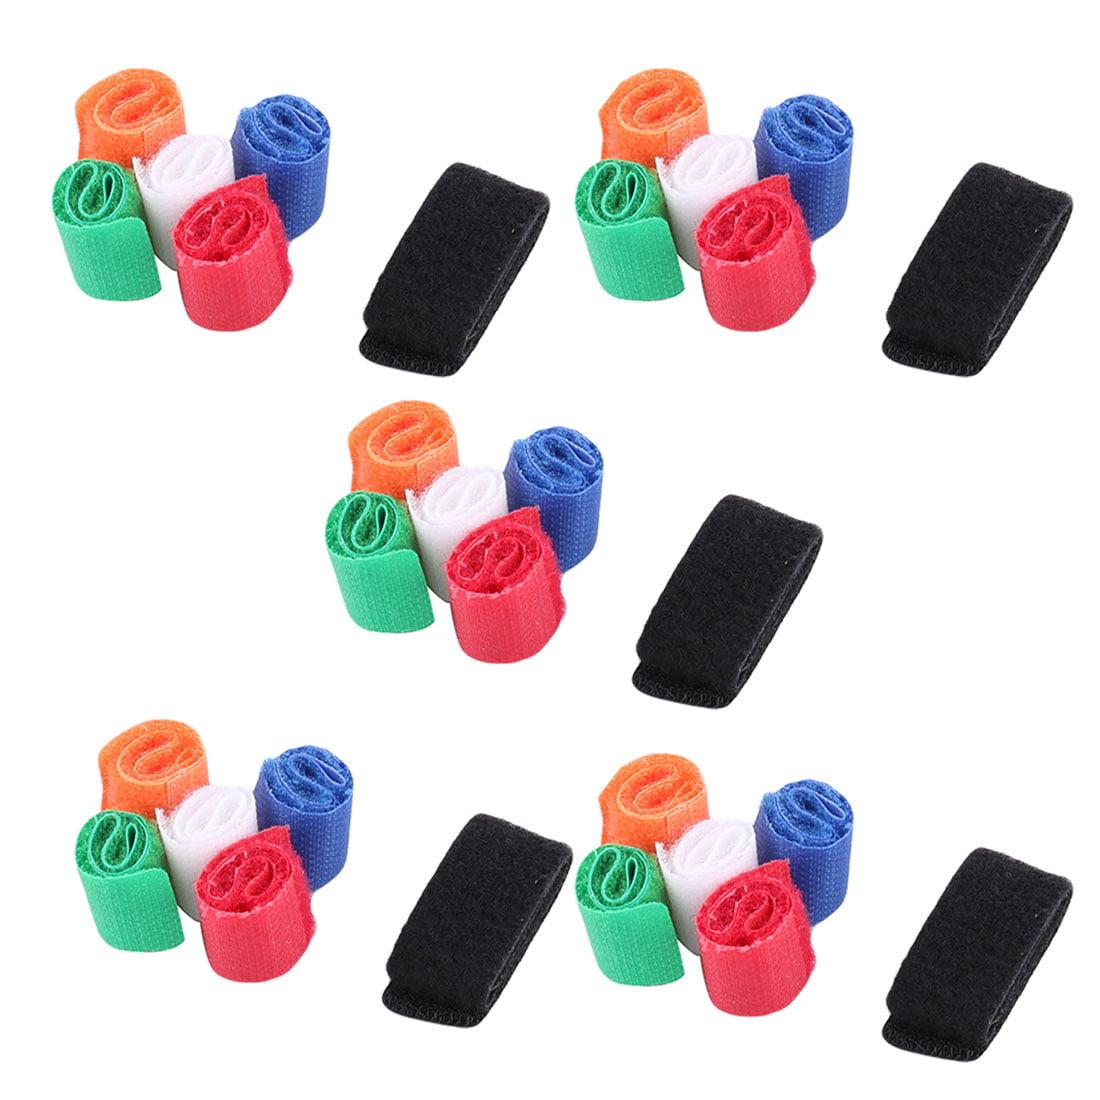 Unique Bargains Home Nylon Self-adhesive Management Strap Ties Fastener Hook Loop Tape 30 Pcs